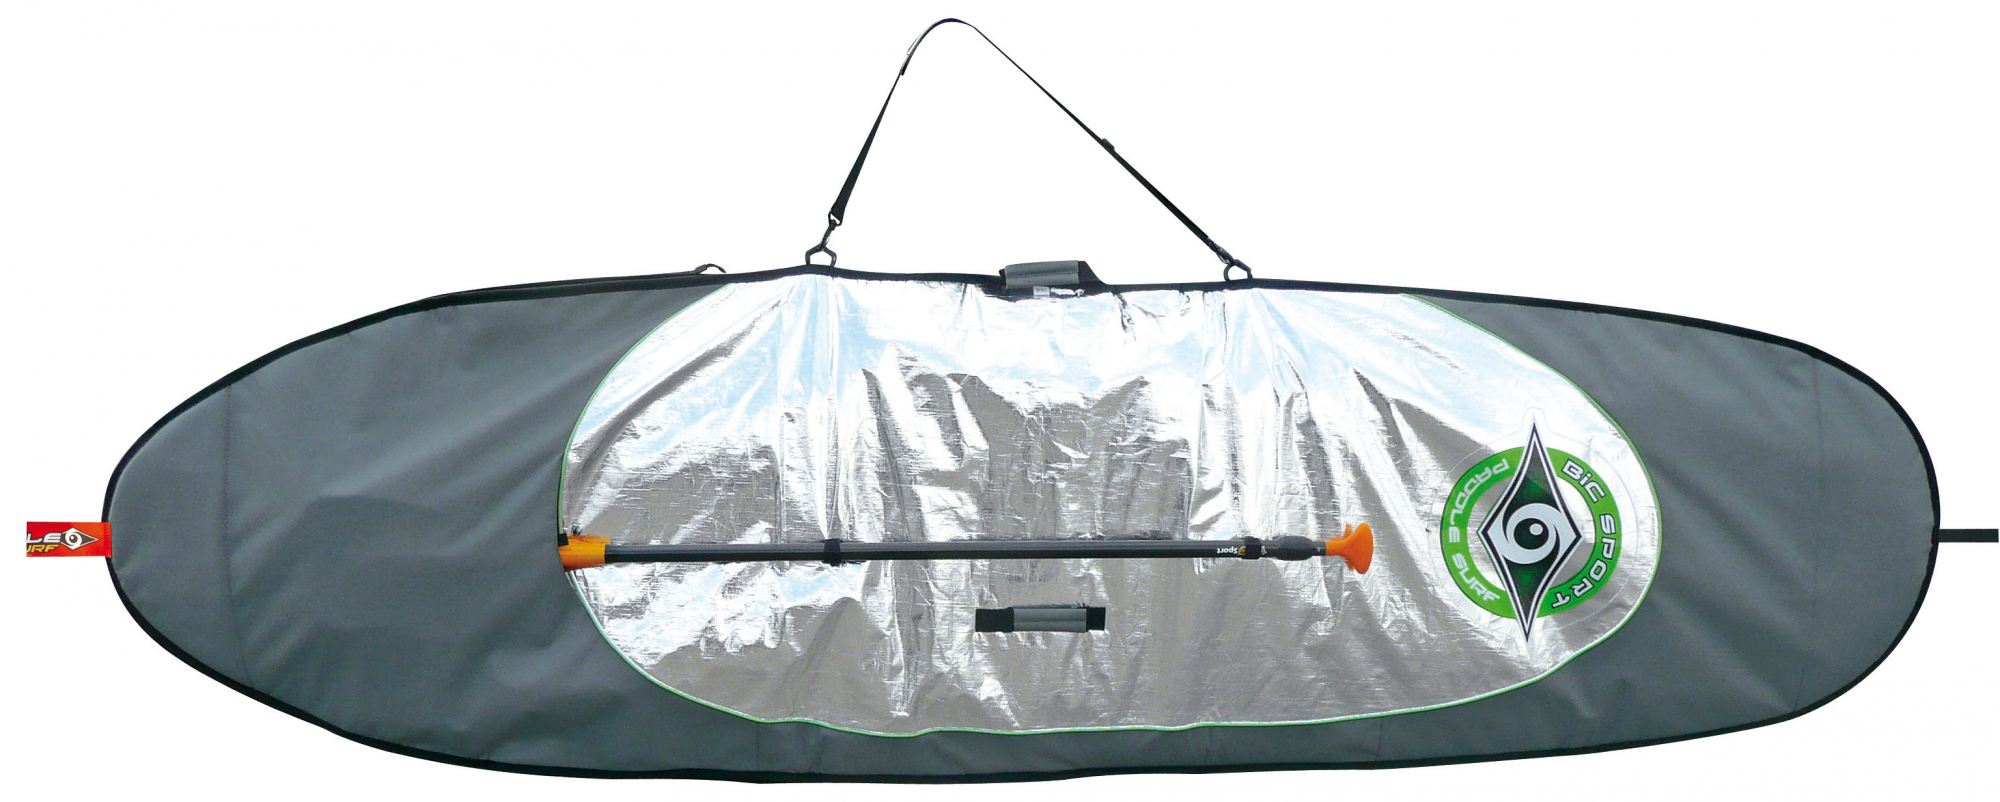 BIC SUP Board Bag Cross